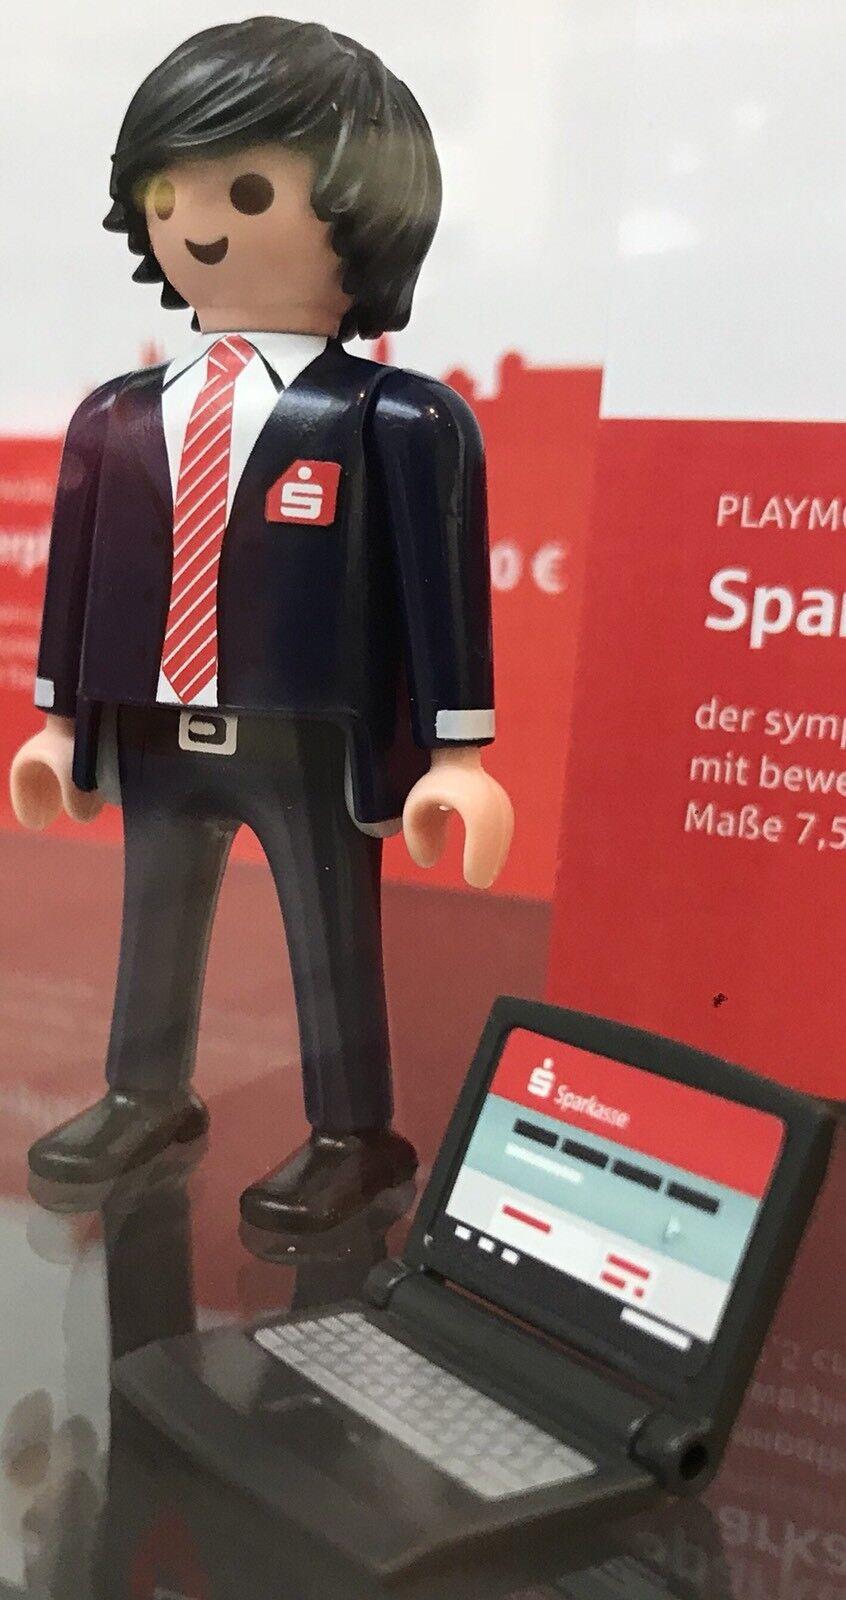 2 X Playmobil- Sparkasse Mann mit Laptop SONDErotITION 2018 + 9232 Bobby-NEU OVP  | Moderate Kosten